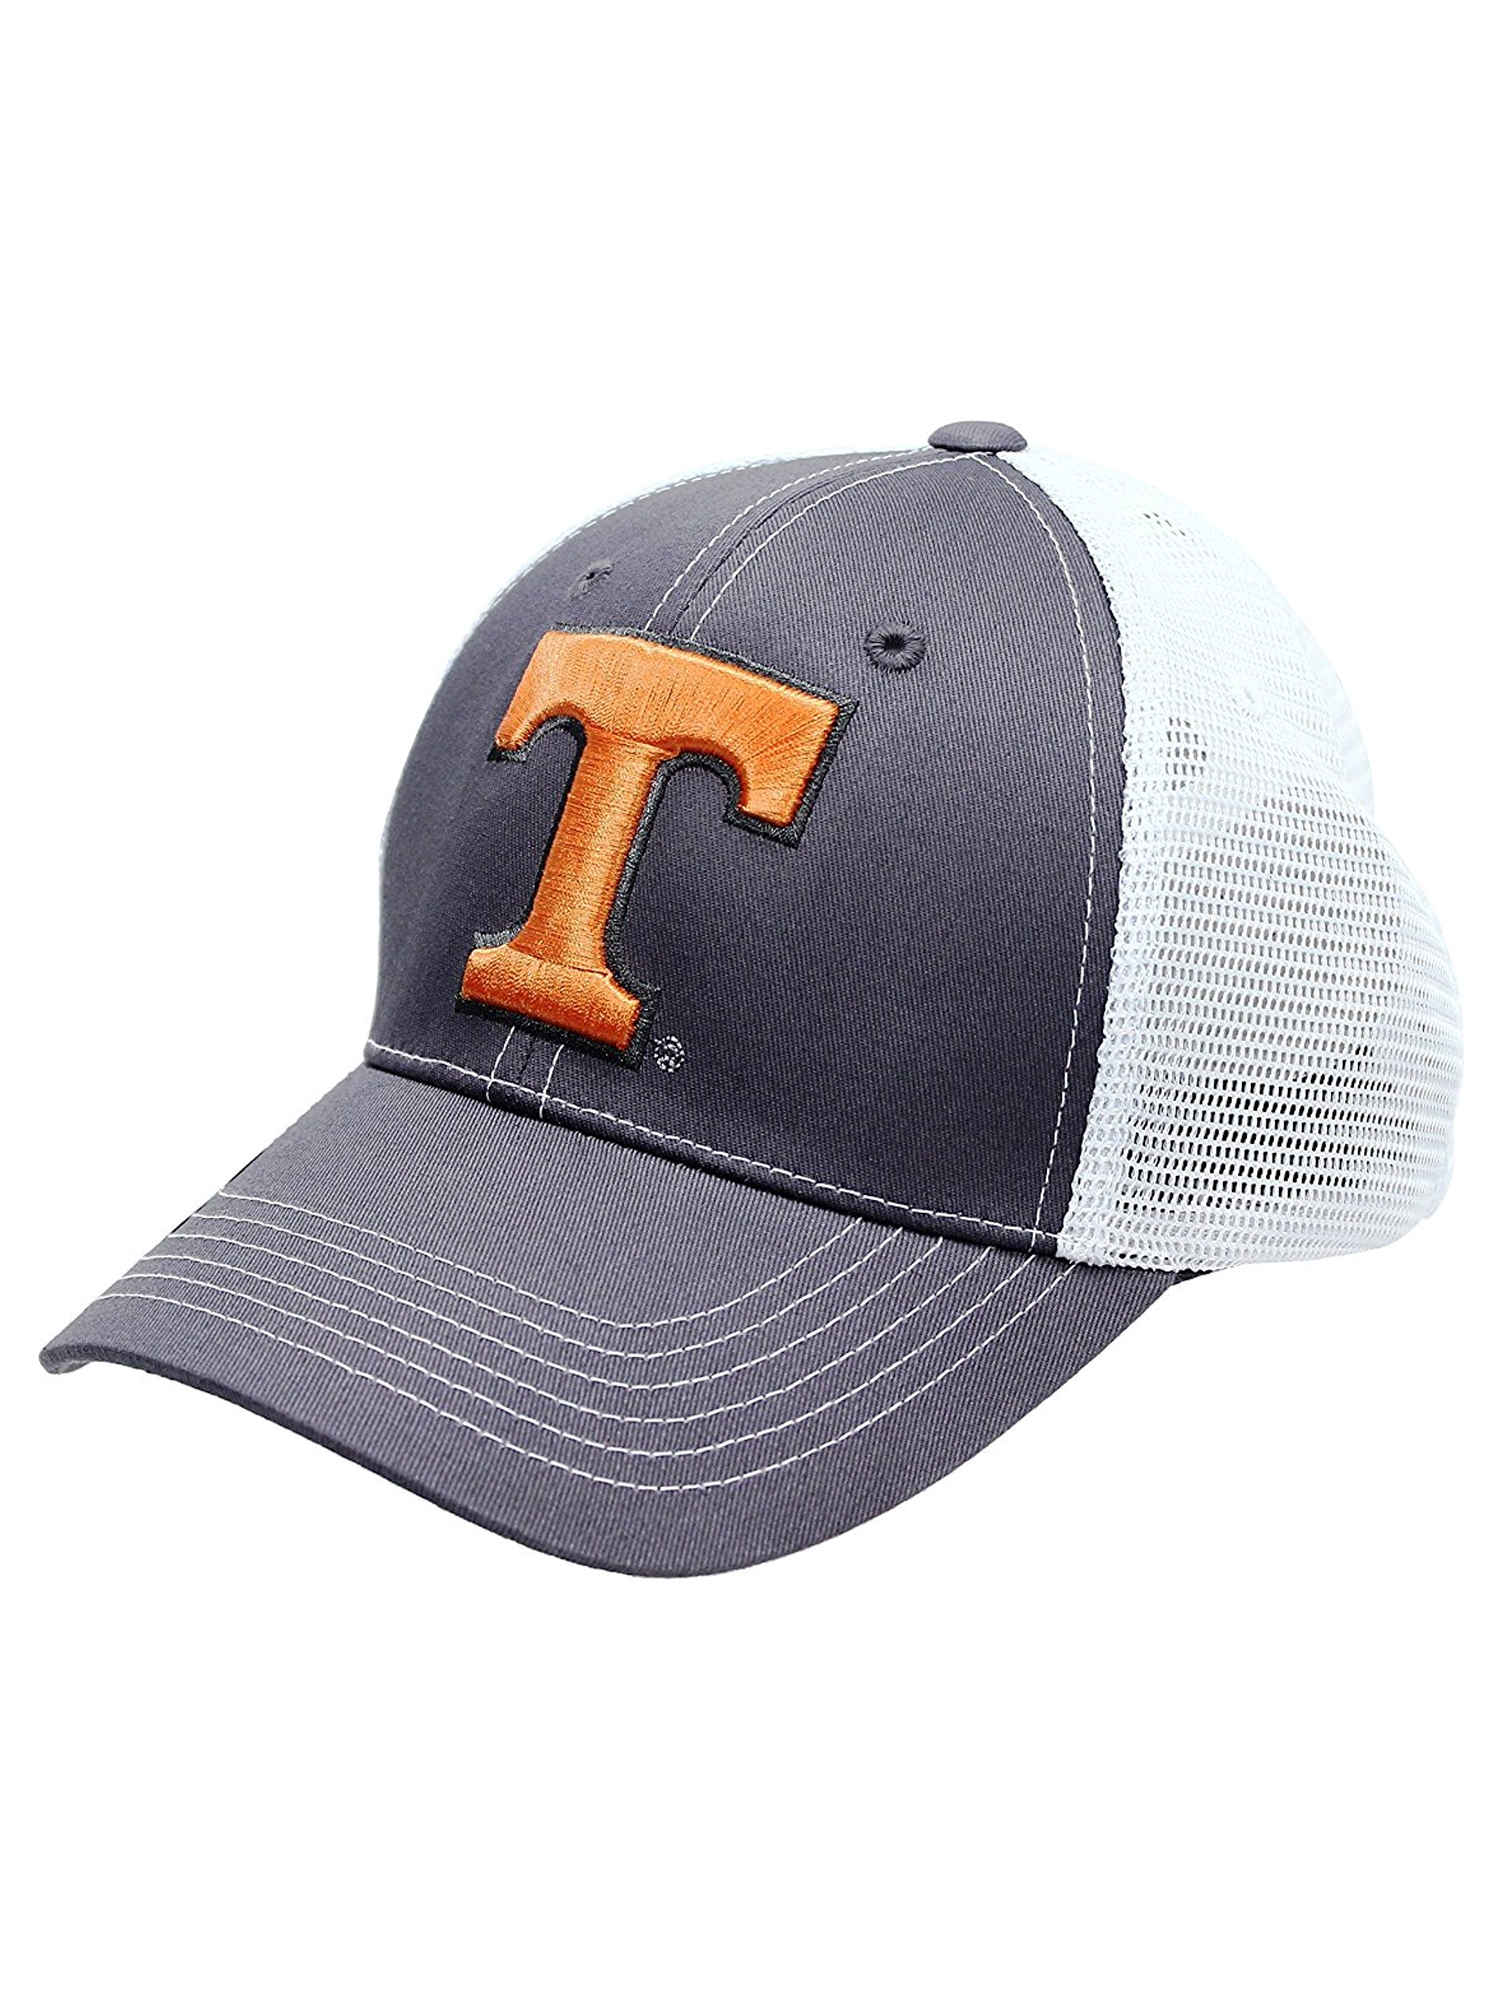 hot sale online 7ac08 b596e australia tennessee volunteers snapback hat adjustable gray mesh cap ncaa  ebay 5031e d66a0